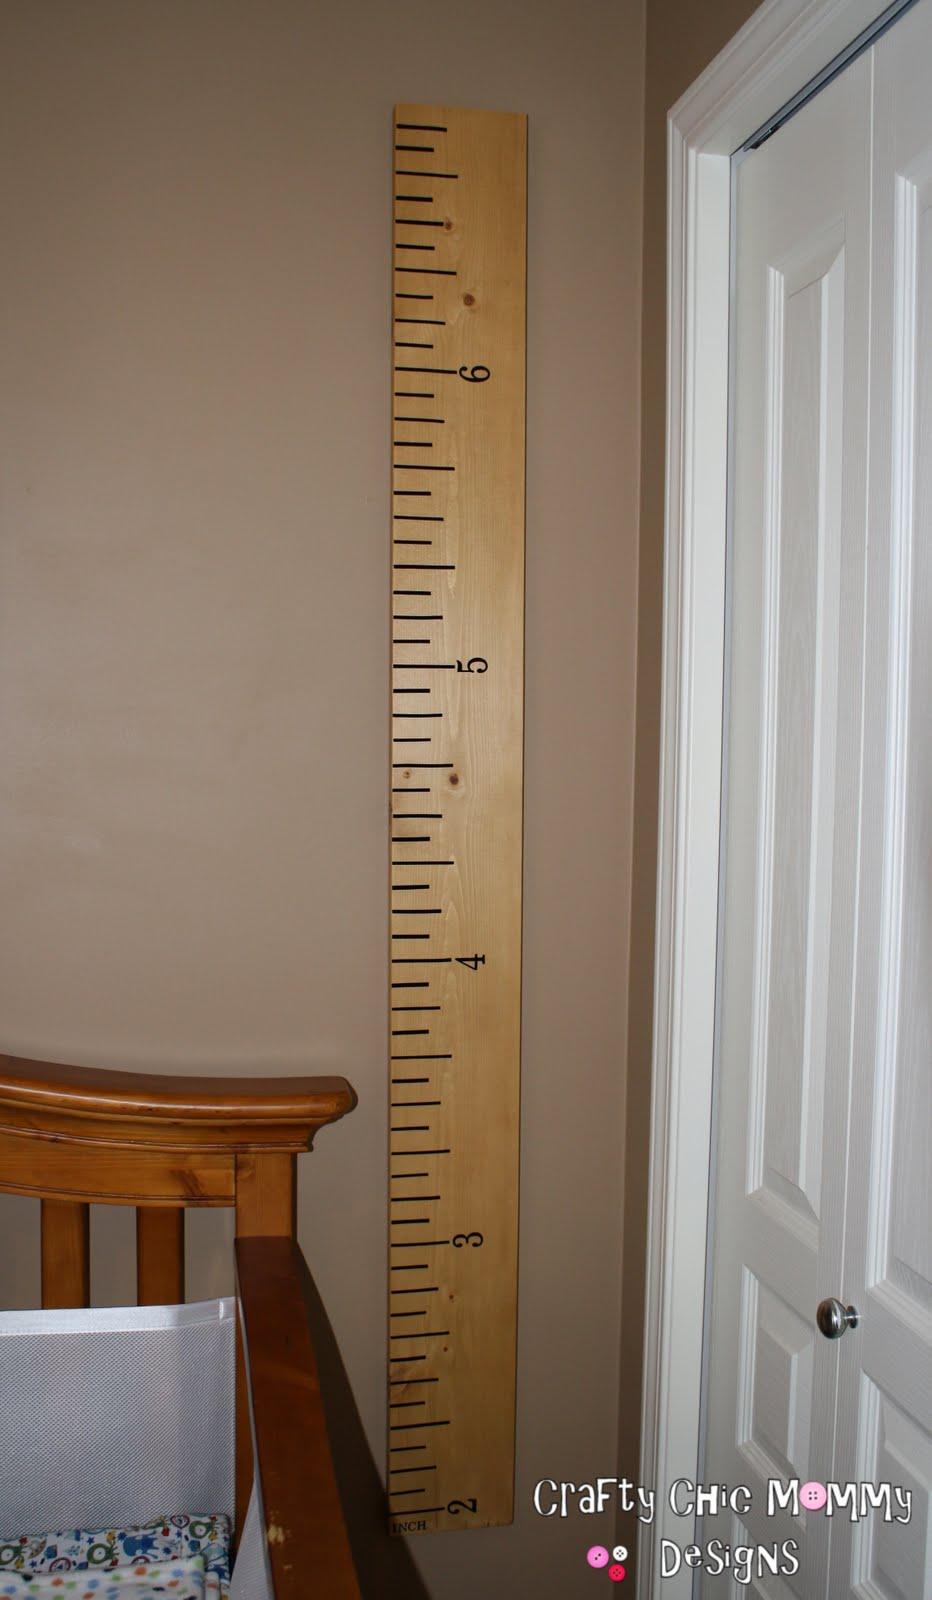 Crafty chic mommy pb ko giant ruler growth chart pb ko giant ruler growth chart nvjuhfo Gallery